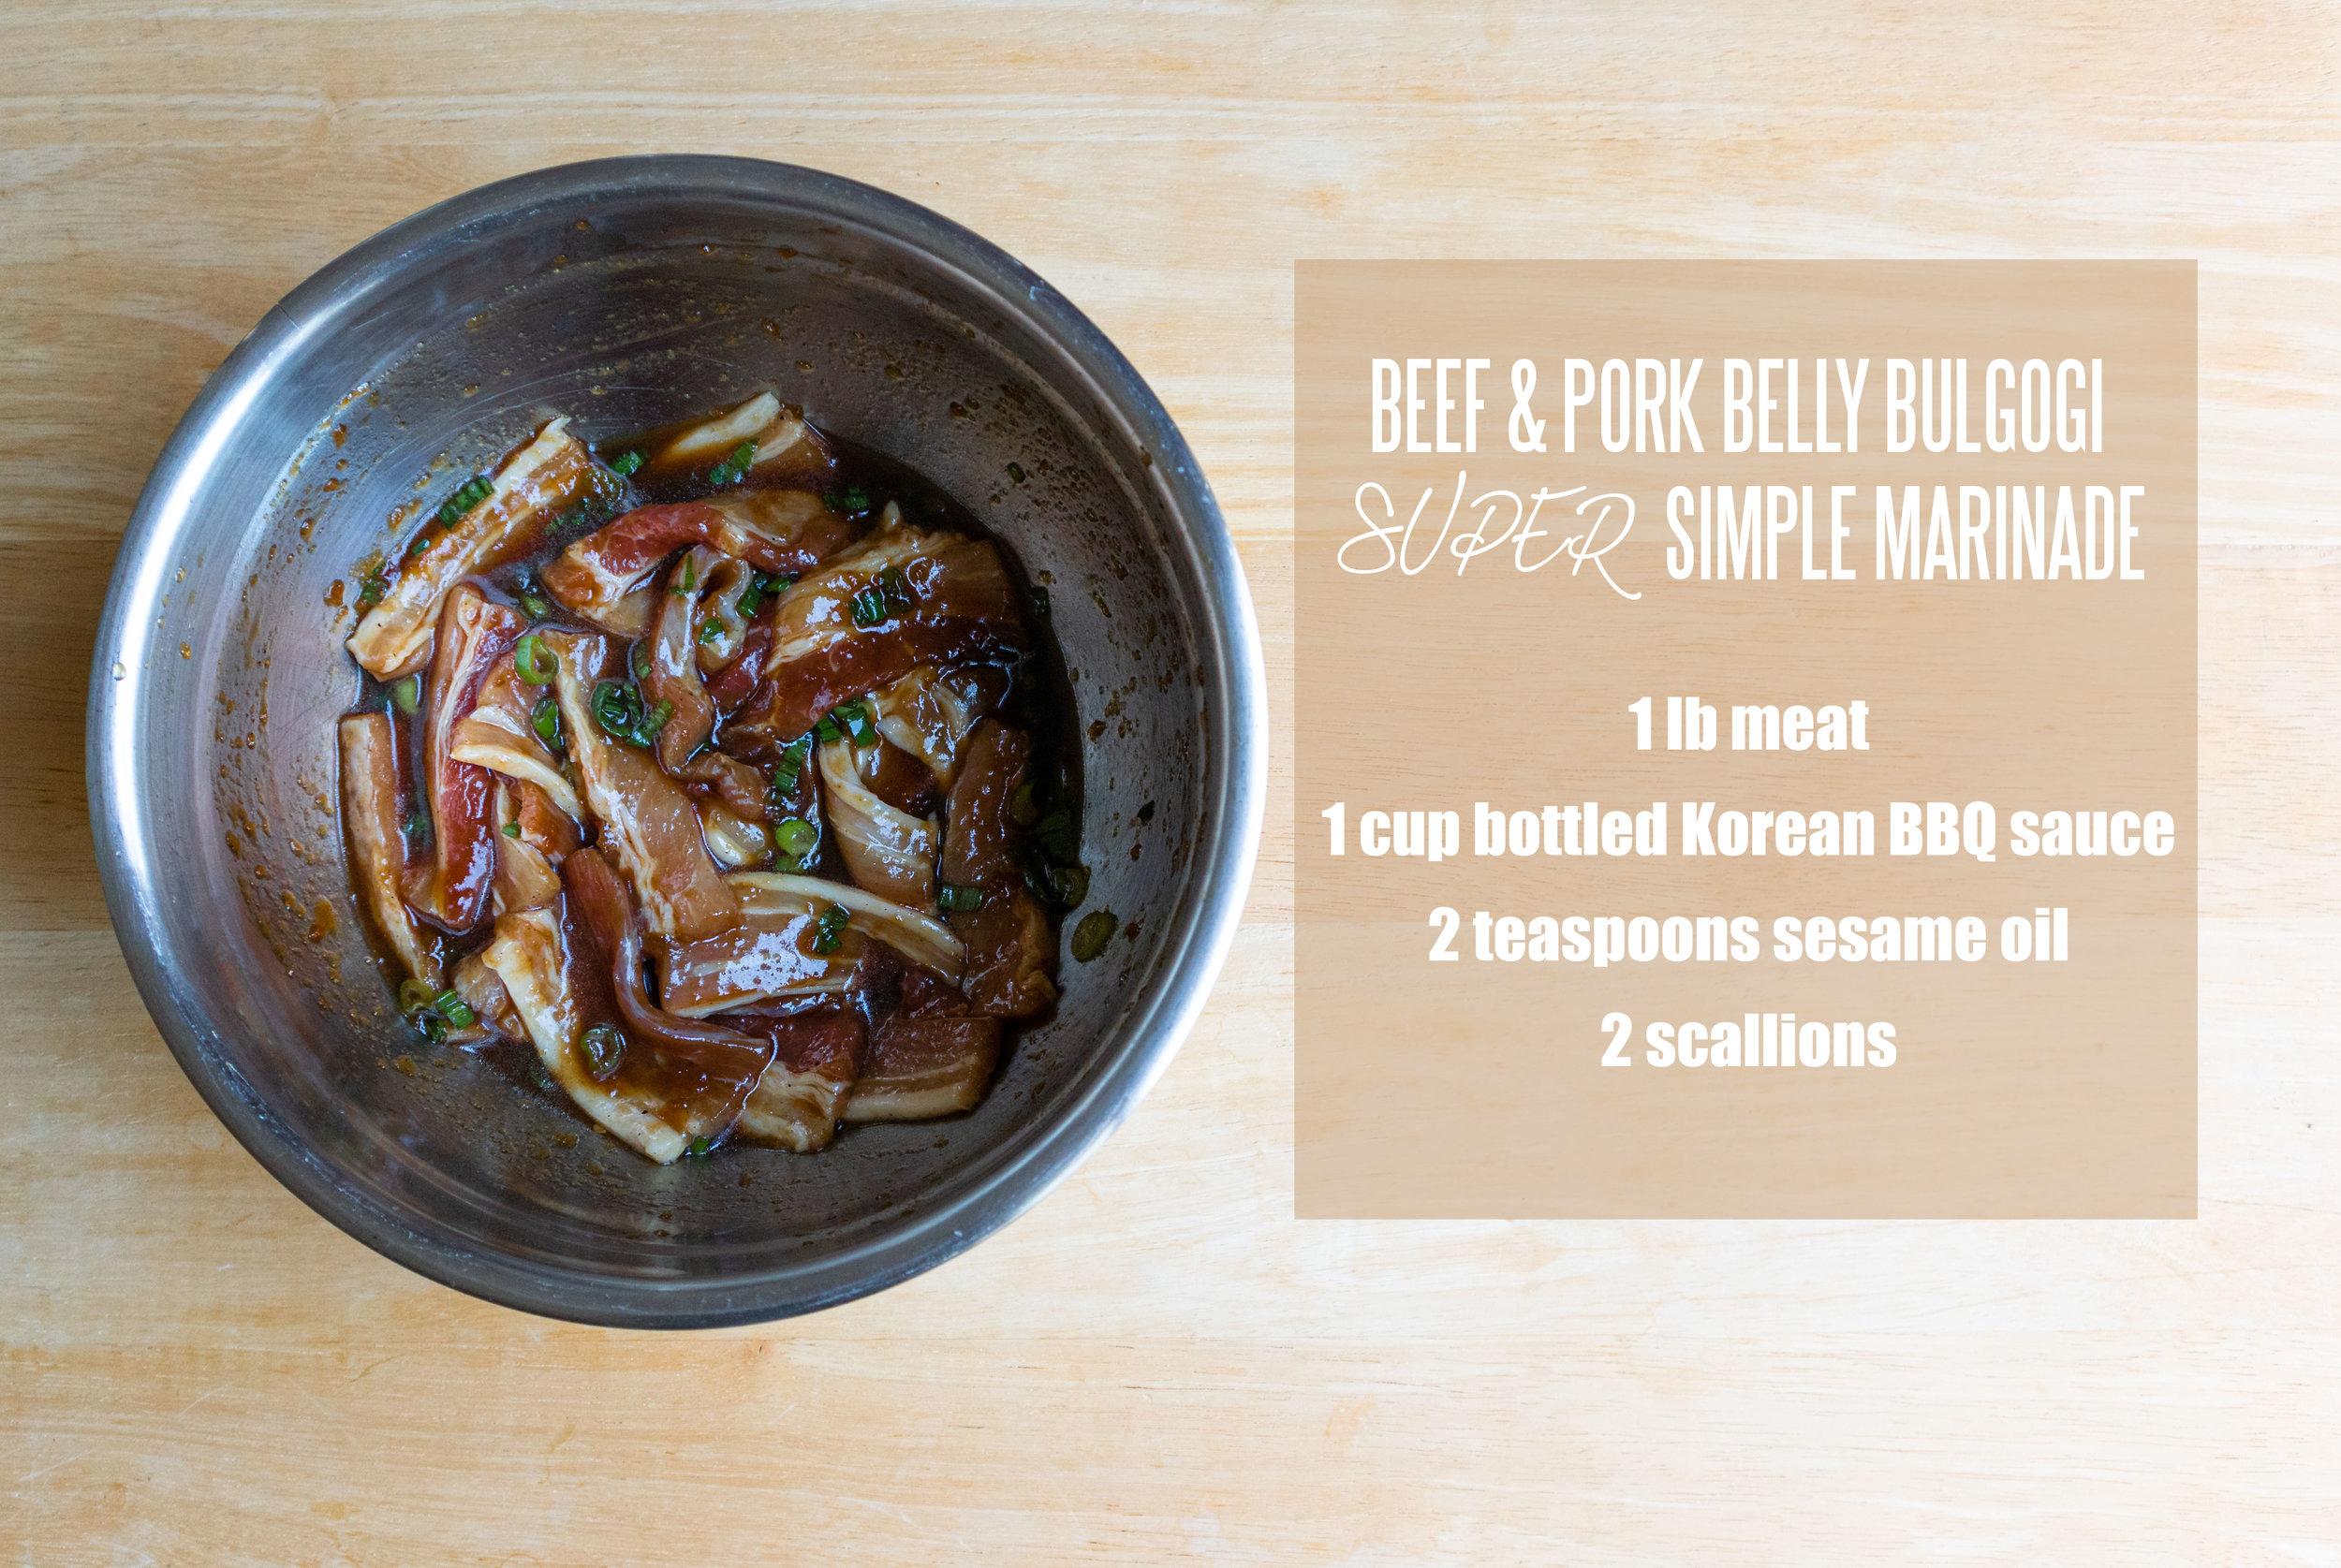 Korean BBQ: Easy Beef & Pork Belly Bulgogi Marinade